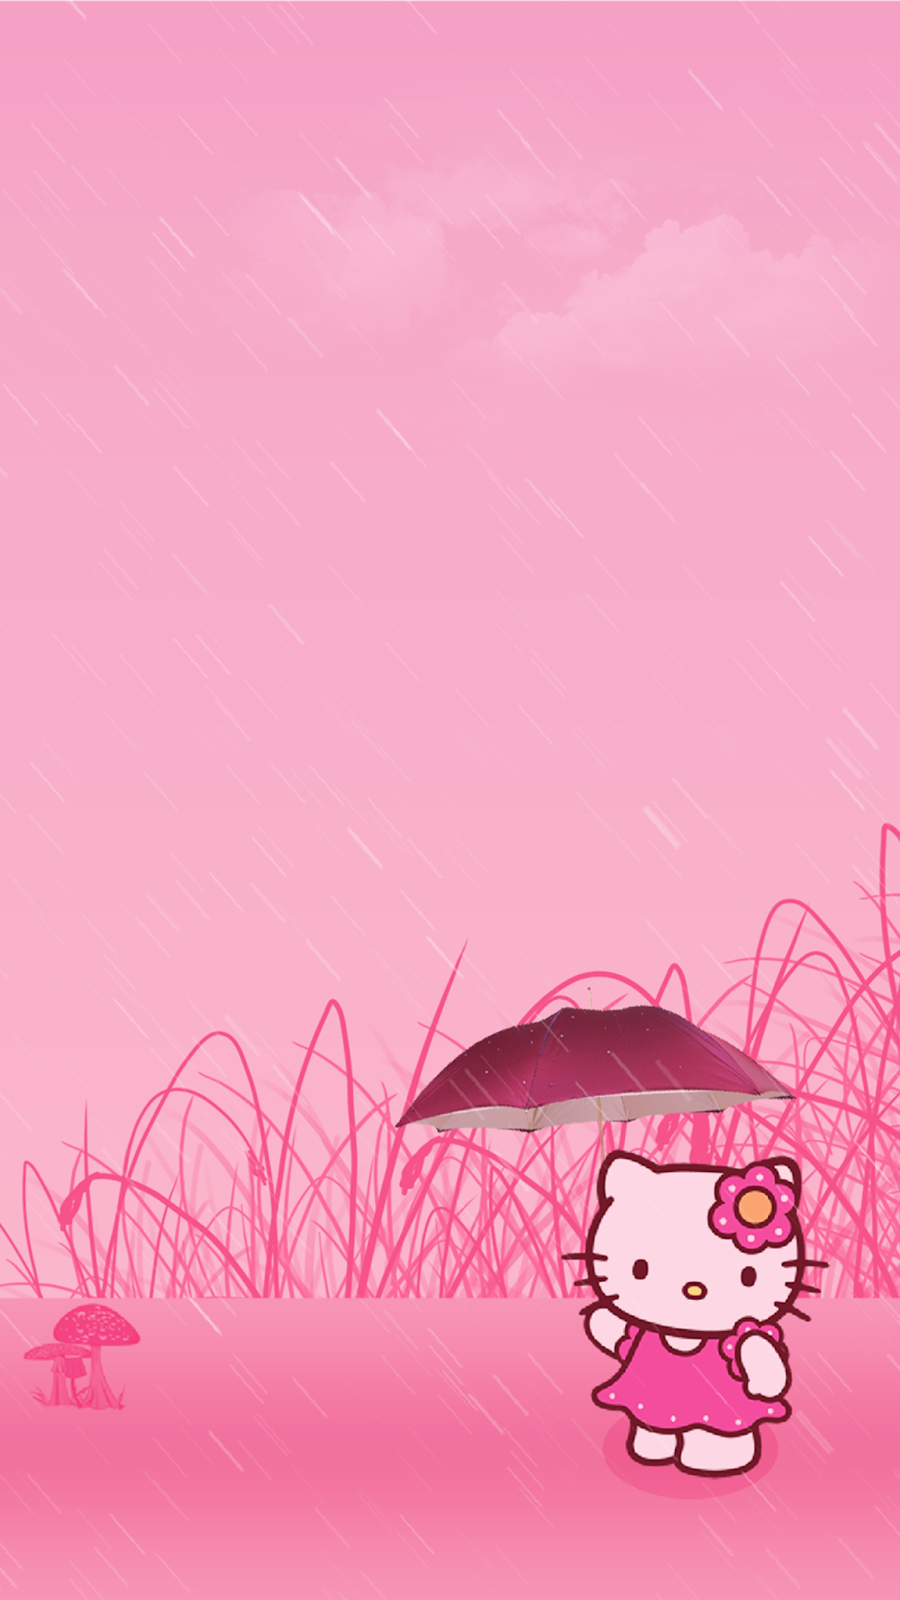 Hello Kitty Wallpaper Kitty Wallpaper